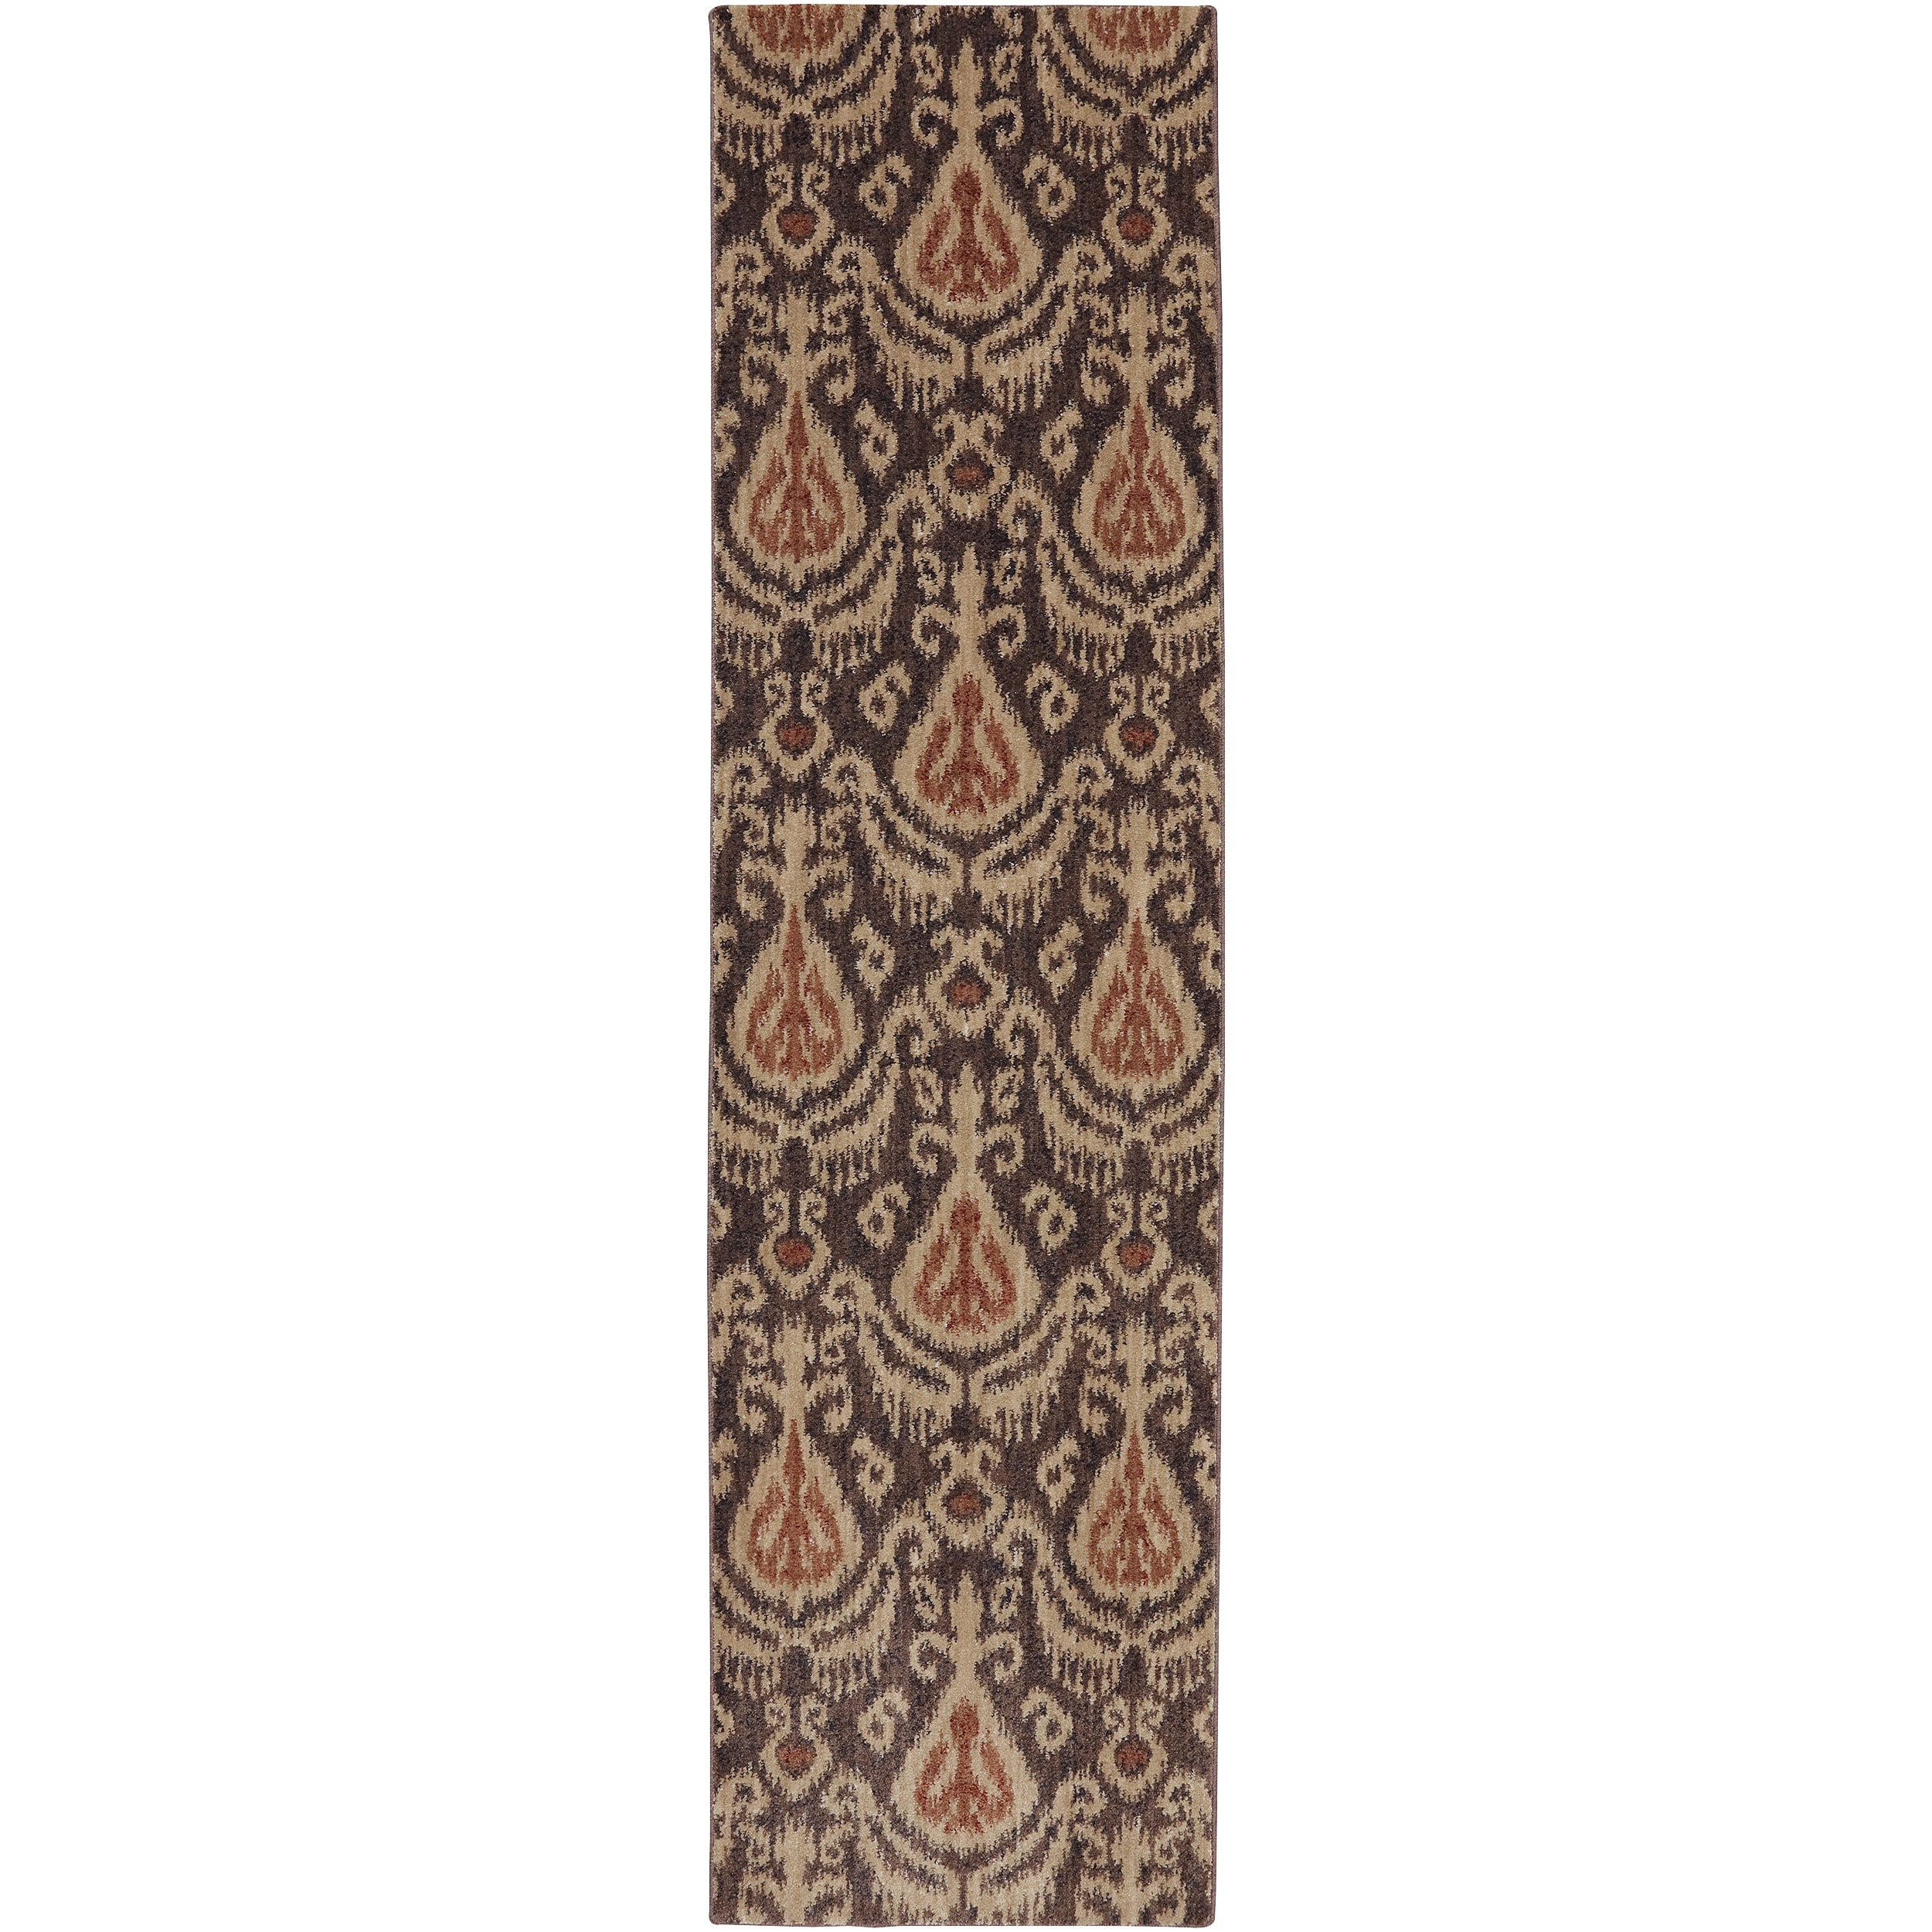 MOHAWK Dryden Chapel Latte Rug (2'1 x 7'10) (Dryden Chape...